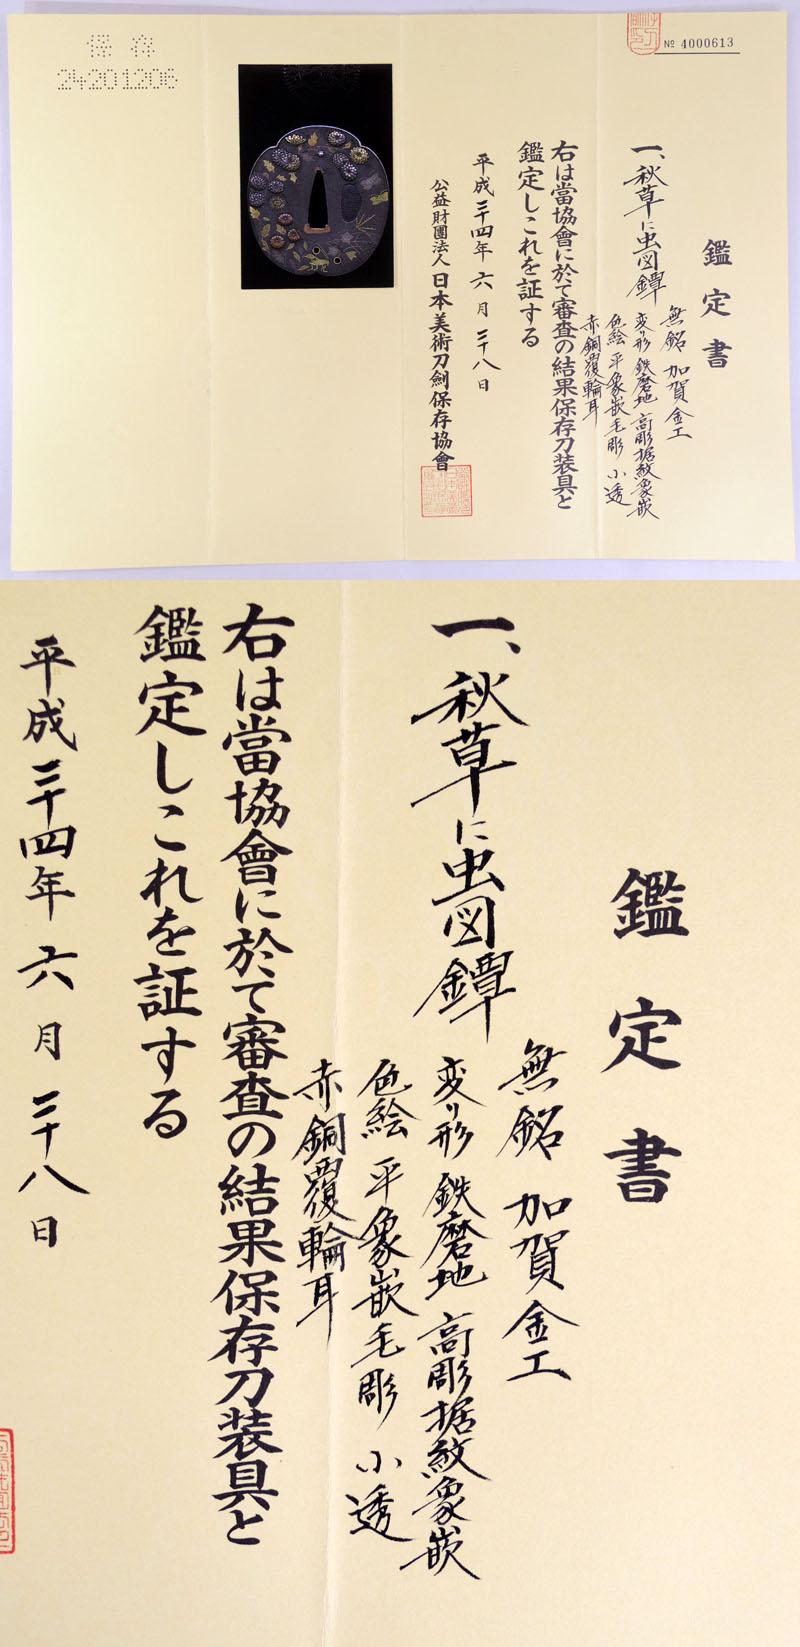 秋草に虫図鐔 無銘 加賀金工 Picture of Certificate